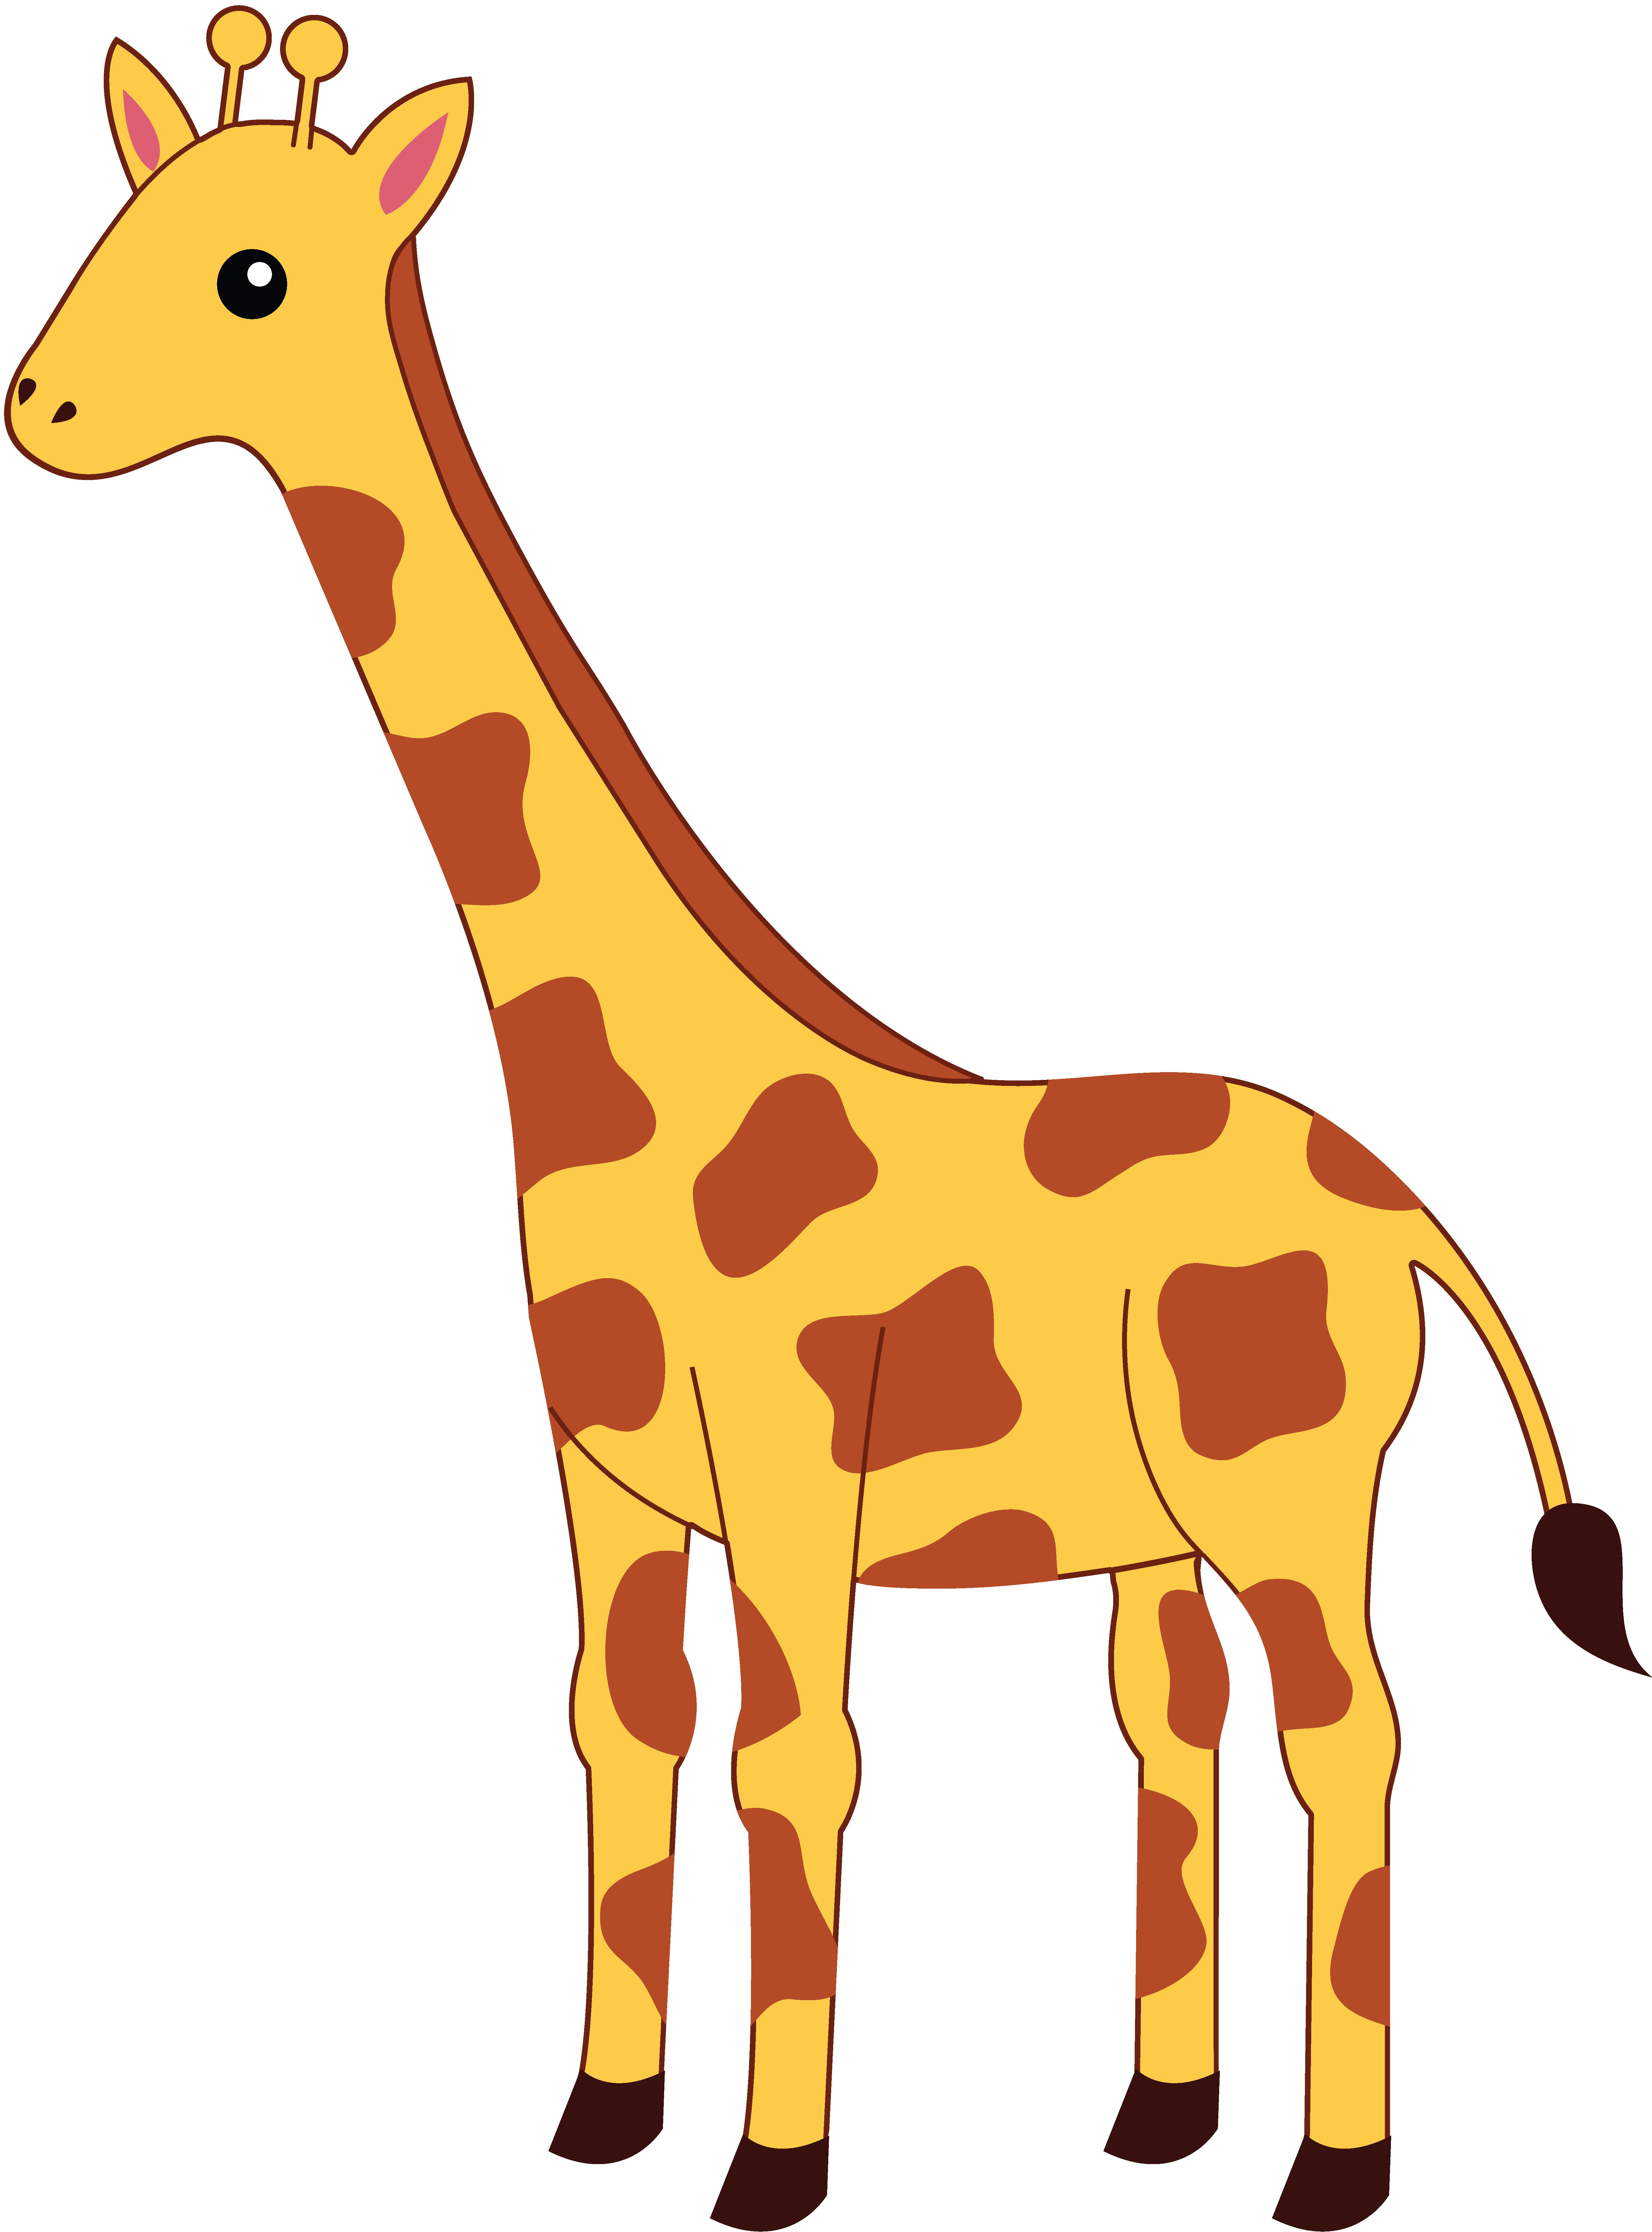 Free Giraffe Cliparts, Download Free Clip Art, Free Clip Art.